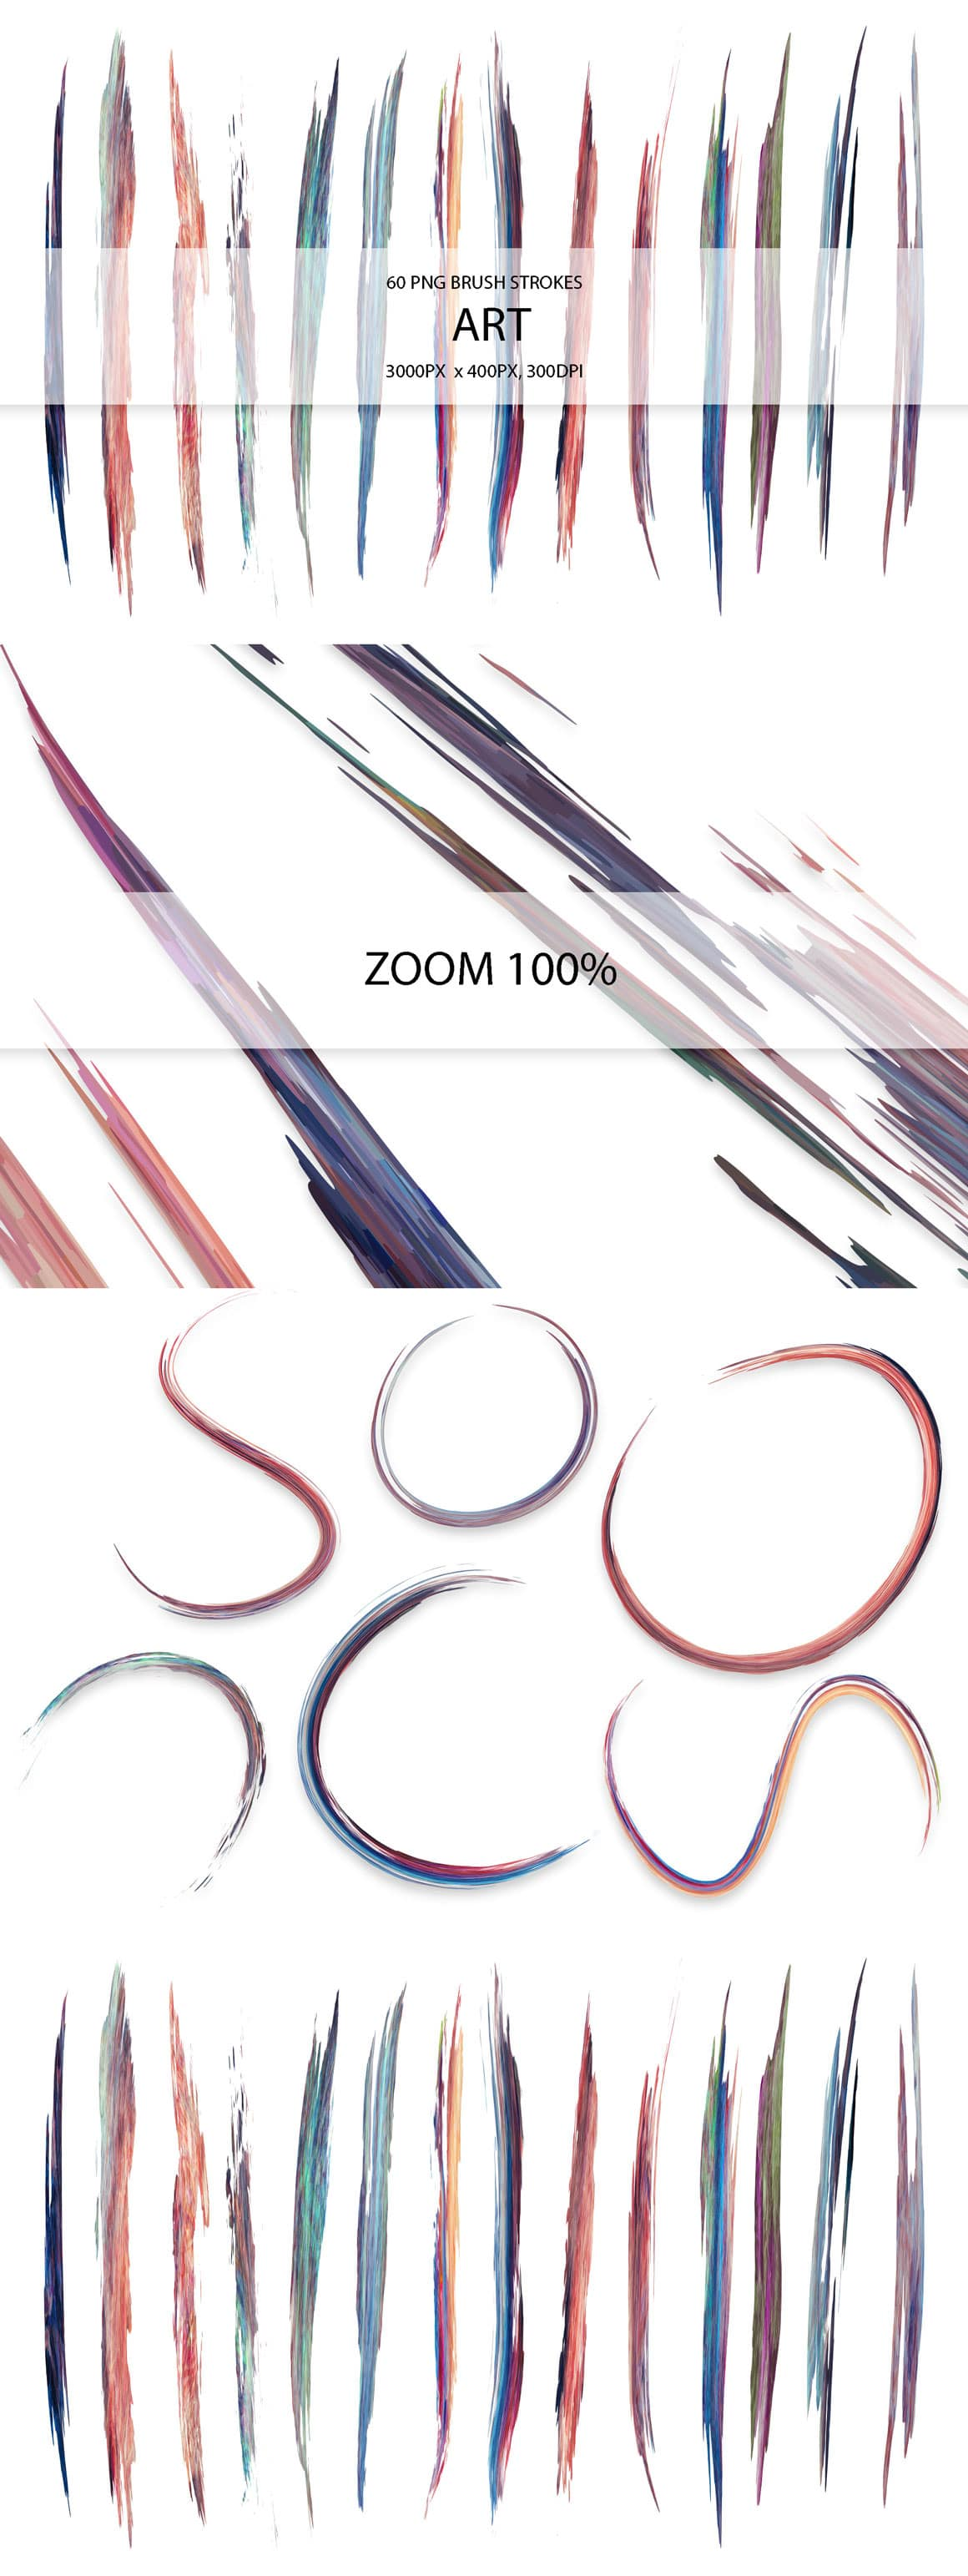 829 Acrylic Brush Strokes and Digital Brush Strokes - $9 - ArtStrokes 01 min